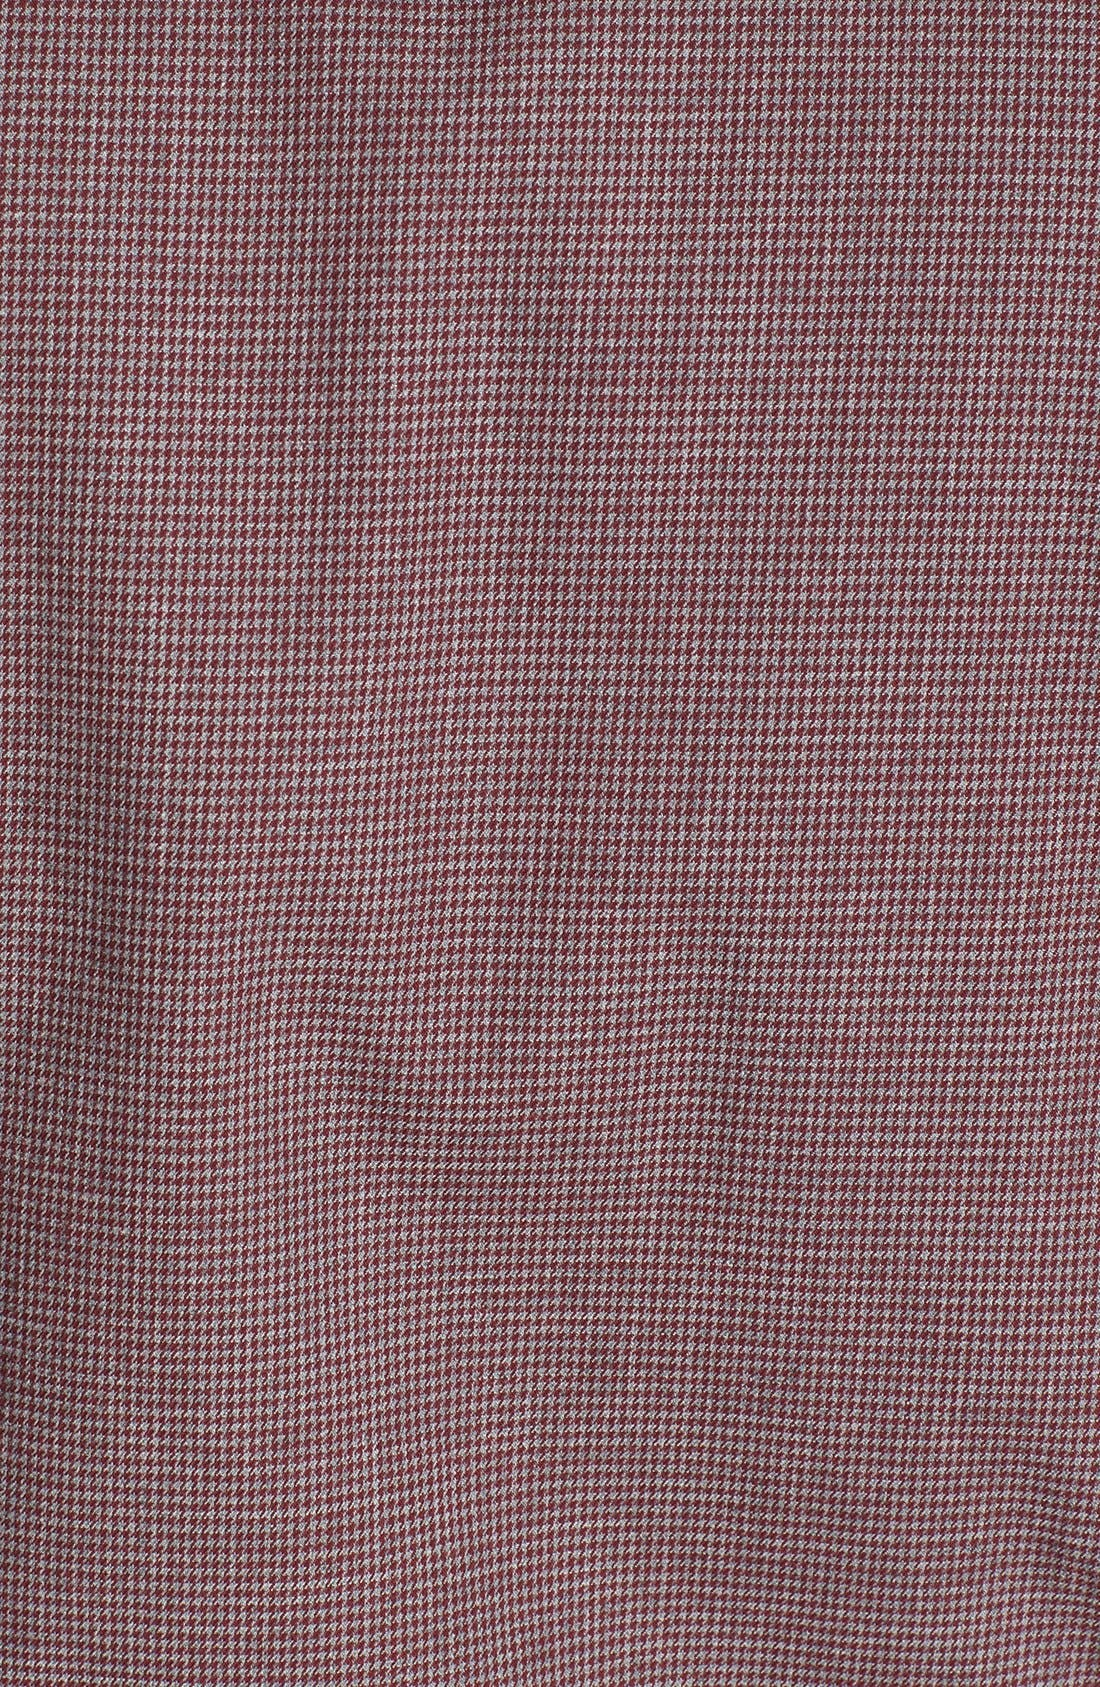 Alternate Image 3  - BOSS HUGO BOSS 'Ronny' Mélange Houndstooth Sport Shirt